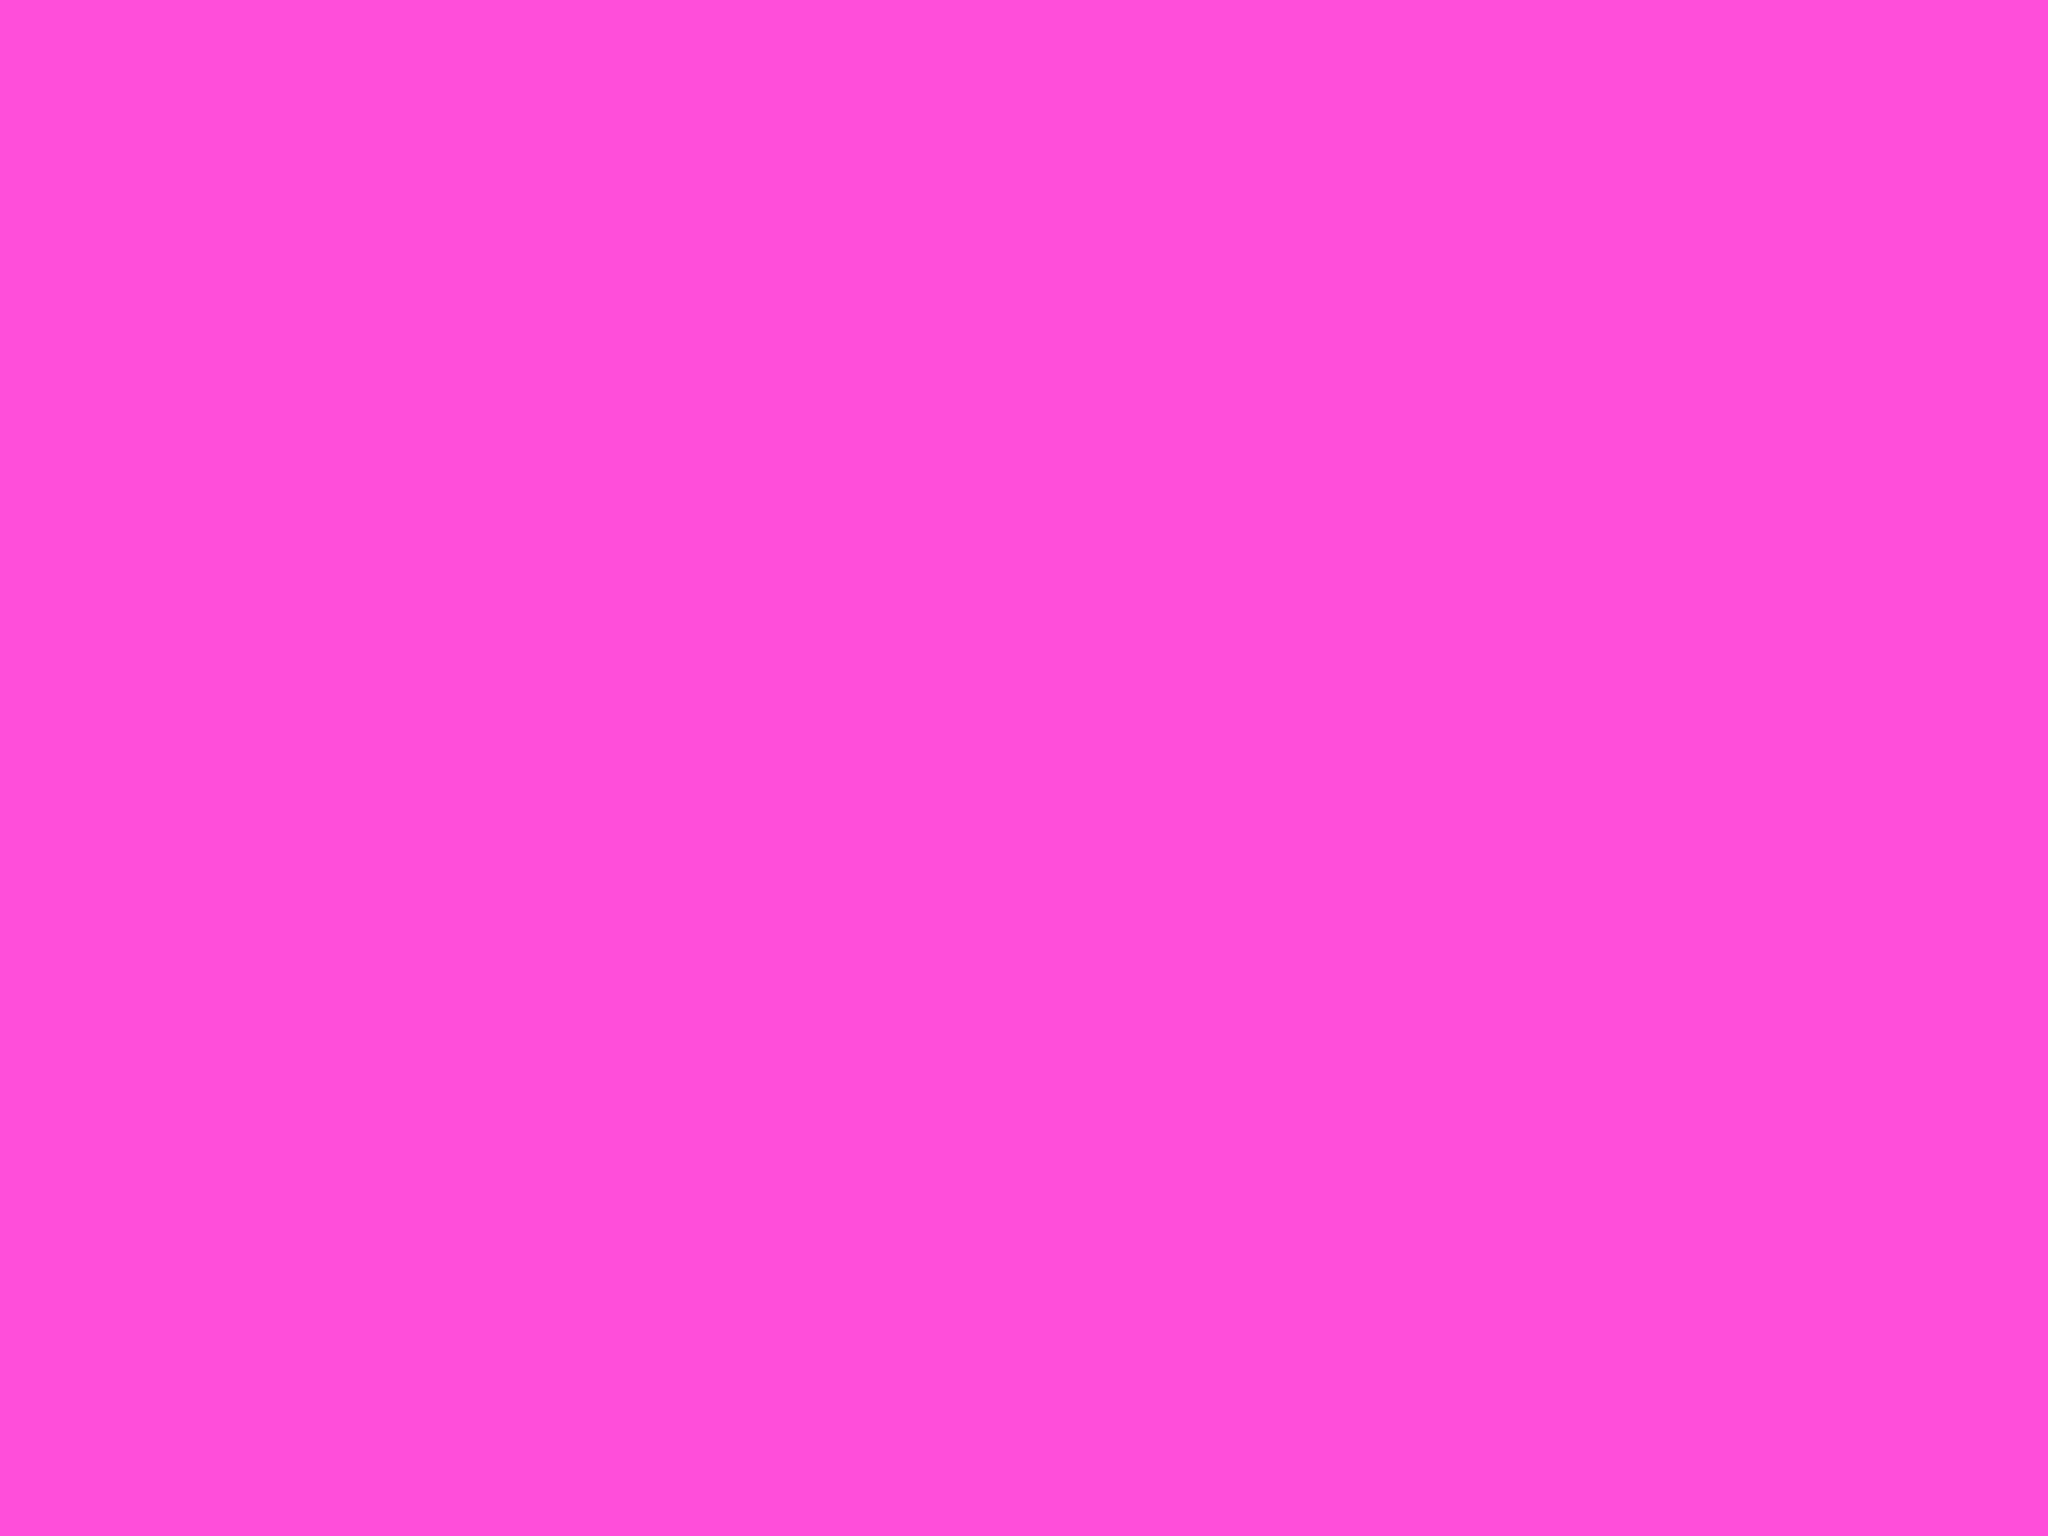 2048x1536 Purple Pizzazz Solid Color Background